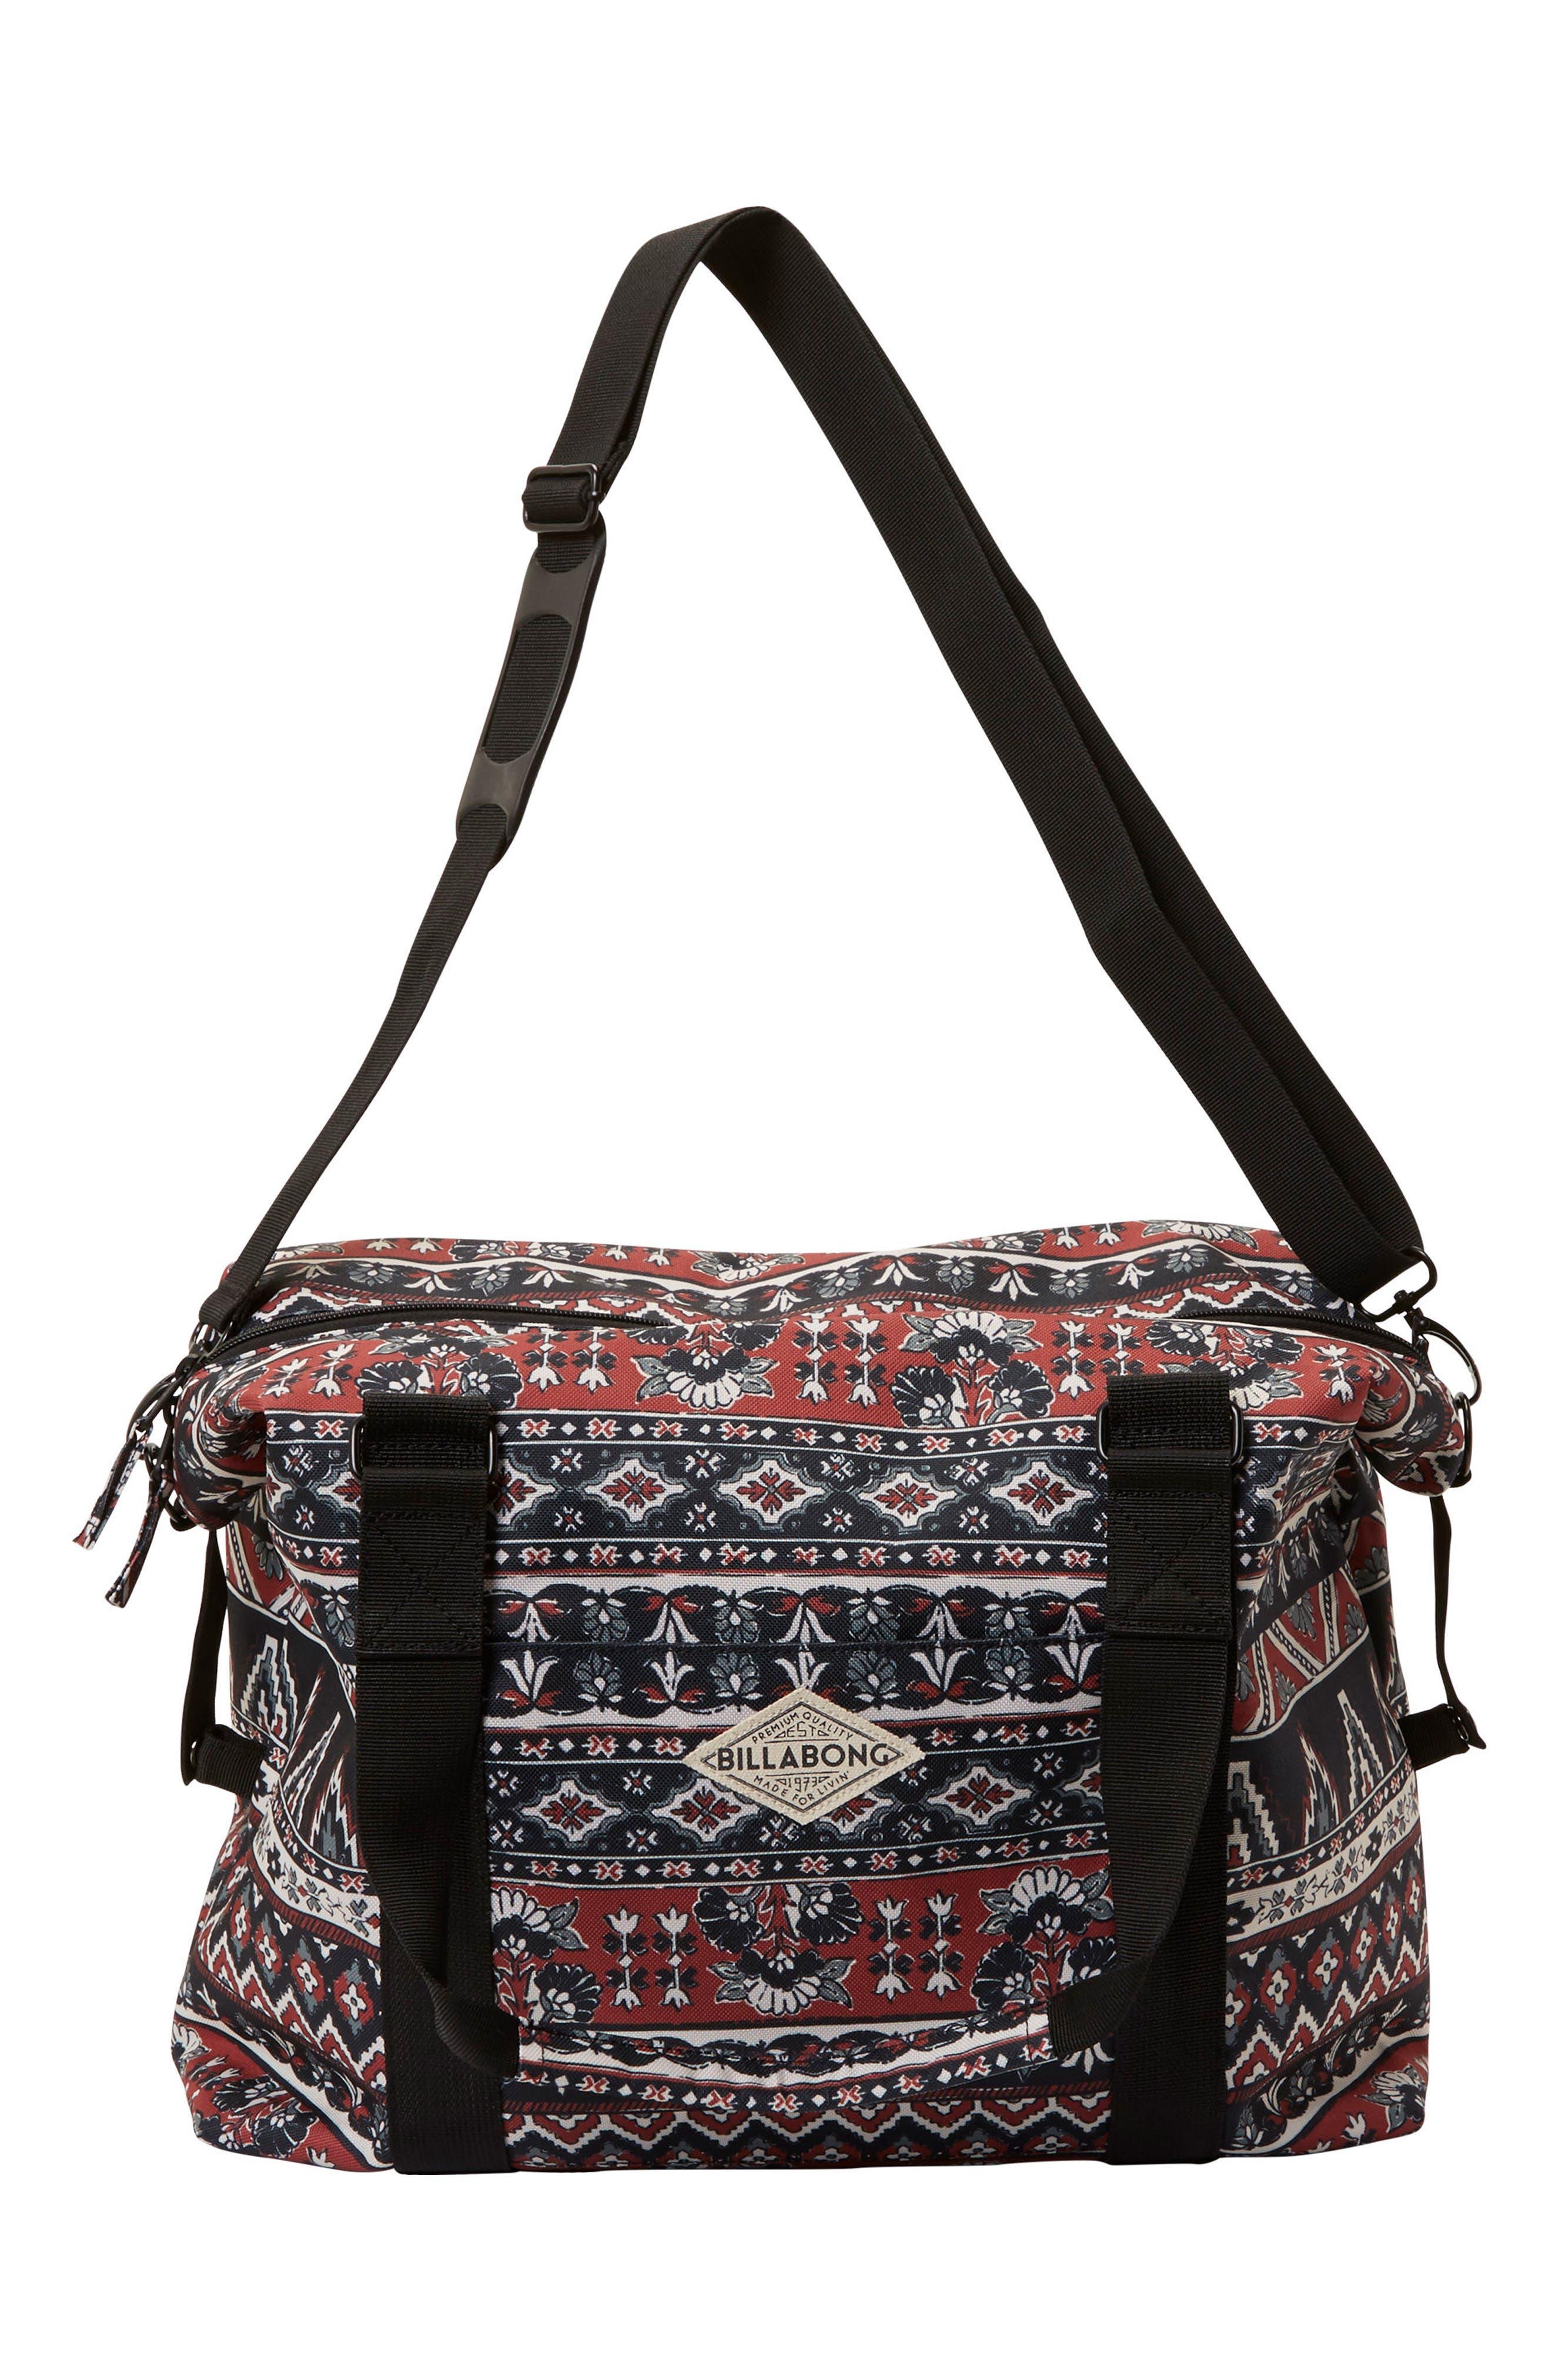 Alternate Image 1 Selected - Billabong Compass Small Duffel Bag